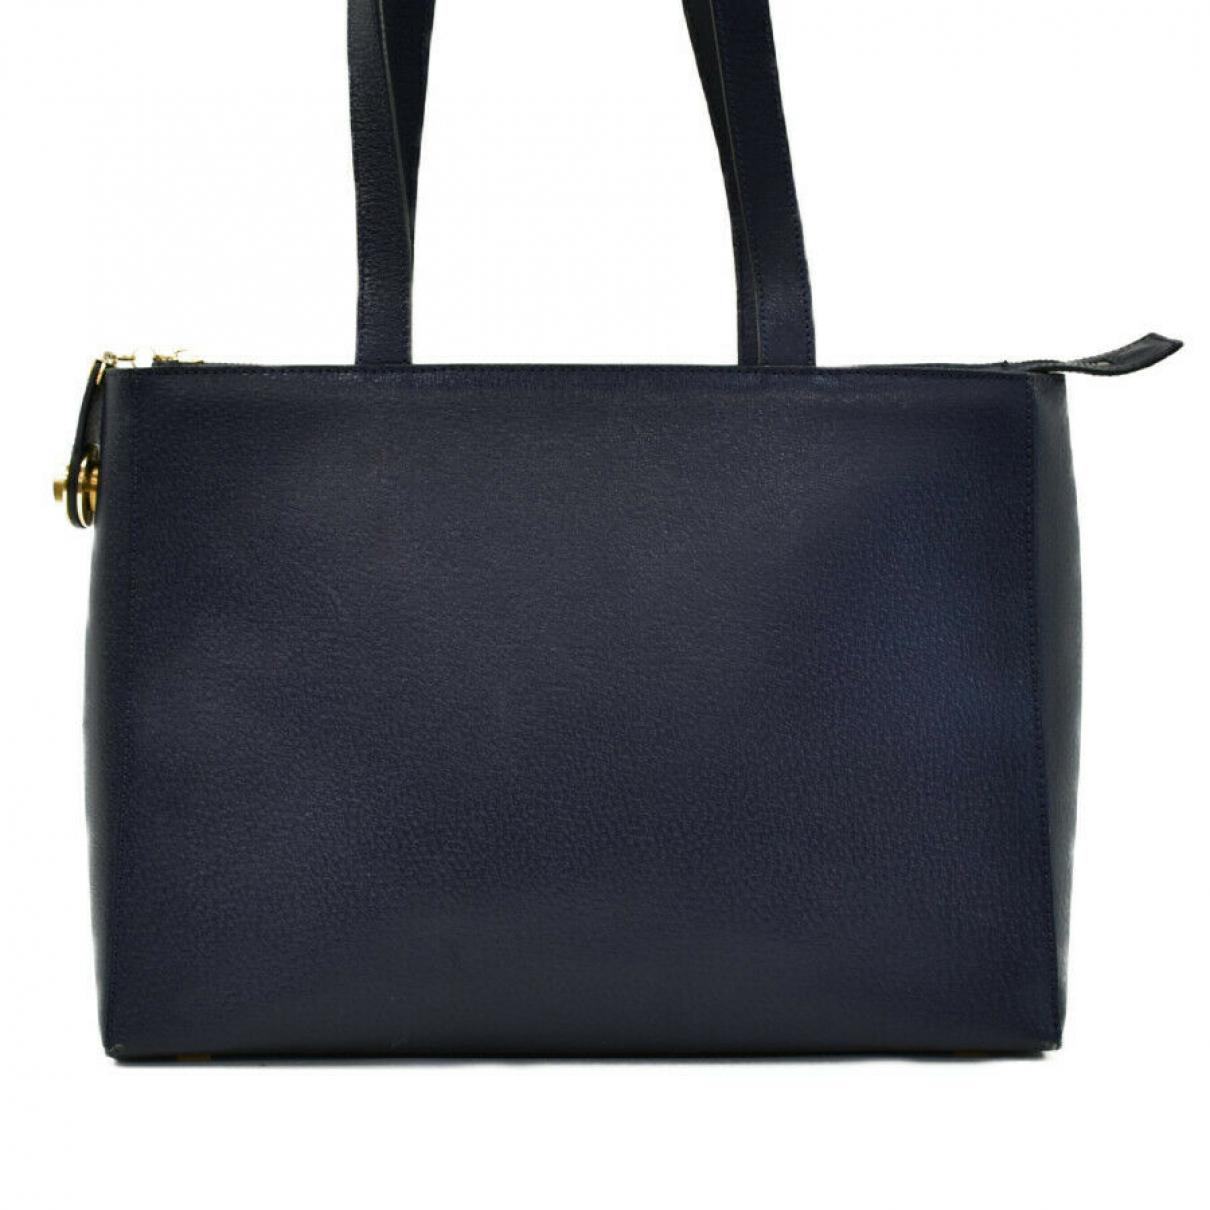 Celine \N Handtasche in  Blau Leder